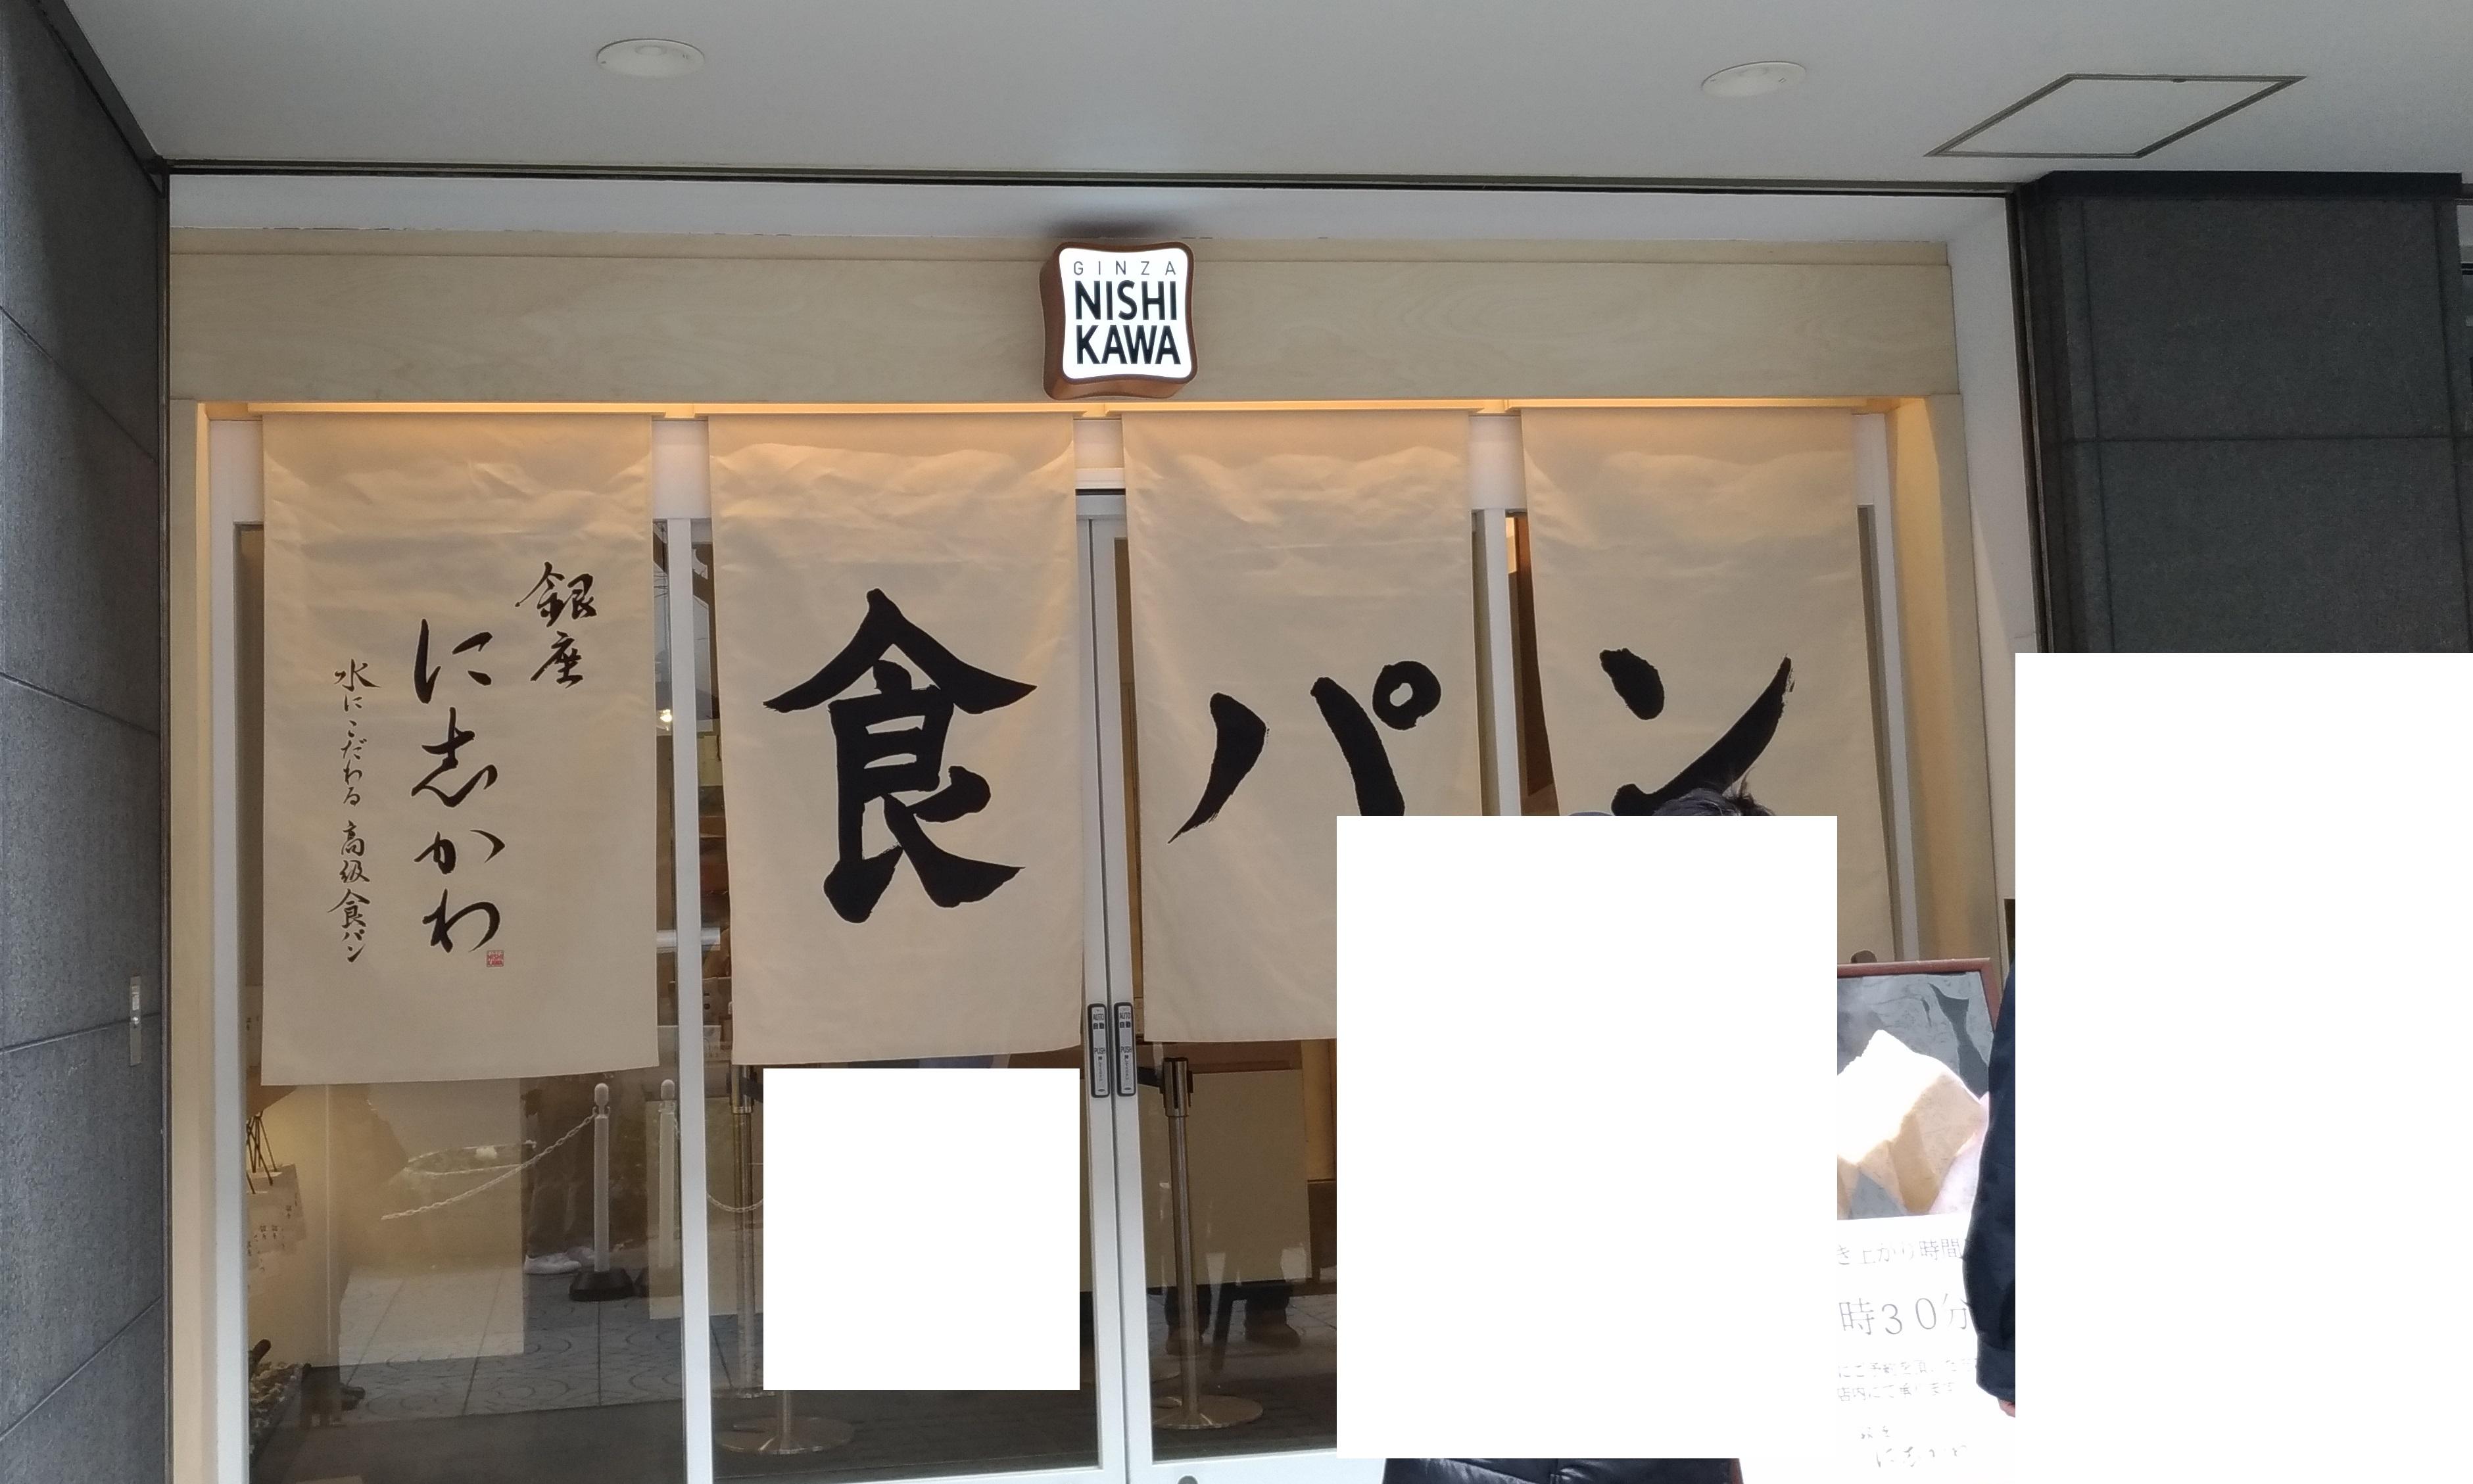 osaka_ginza_shokupan1.jpg